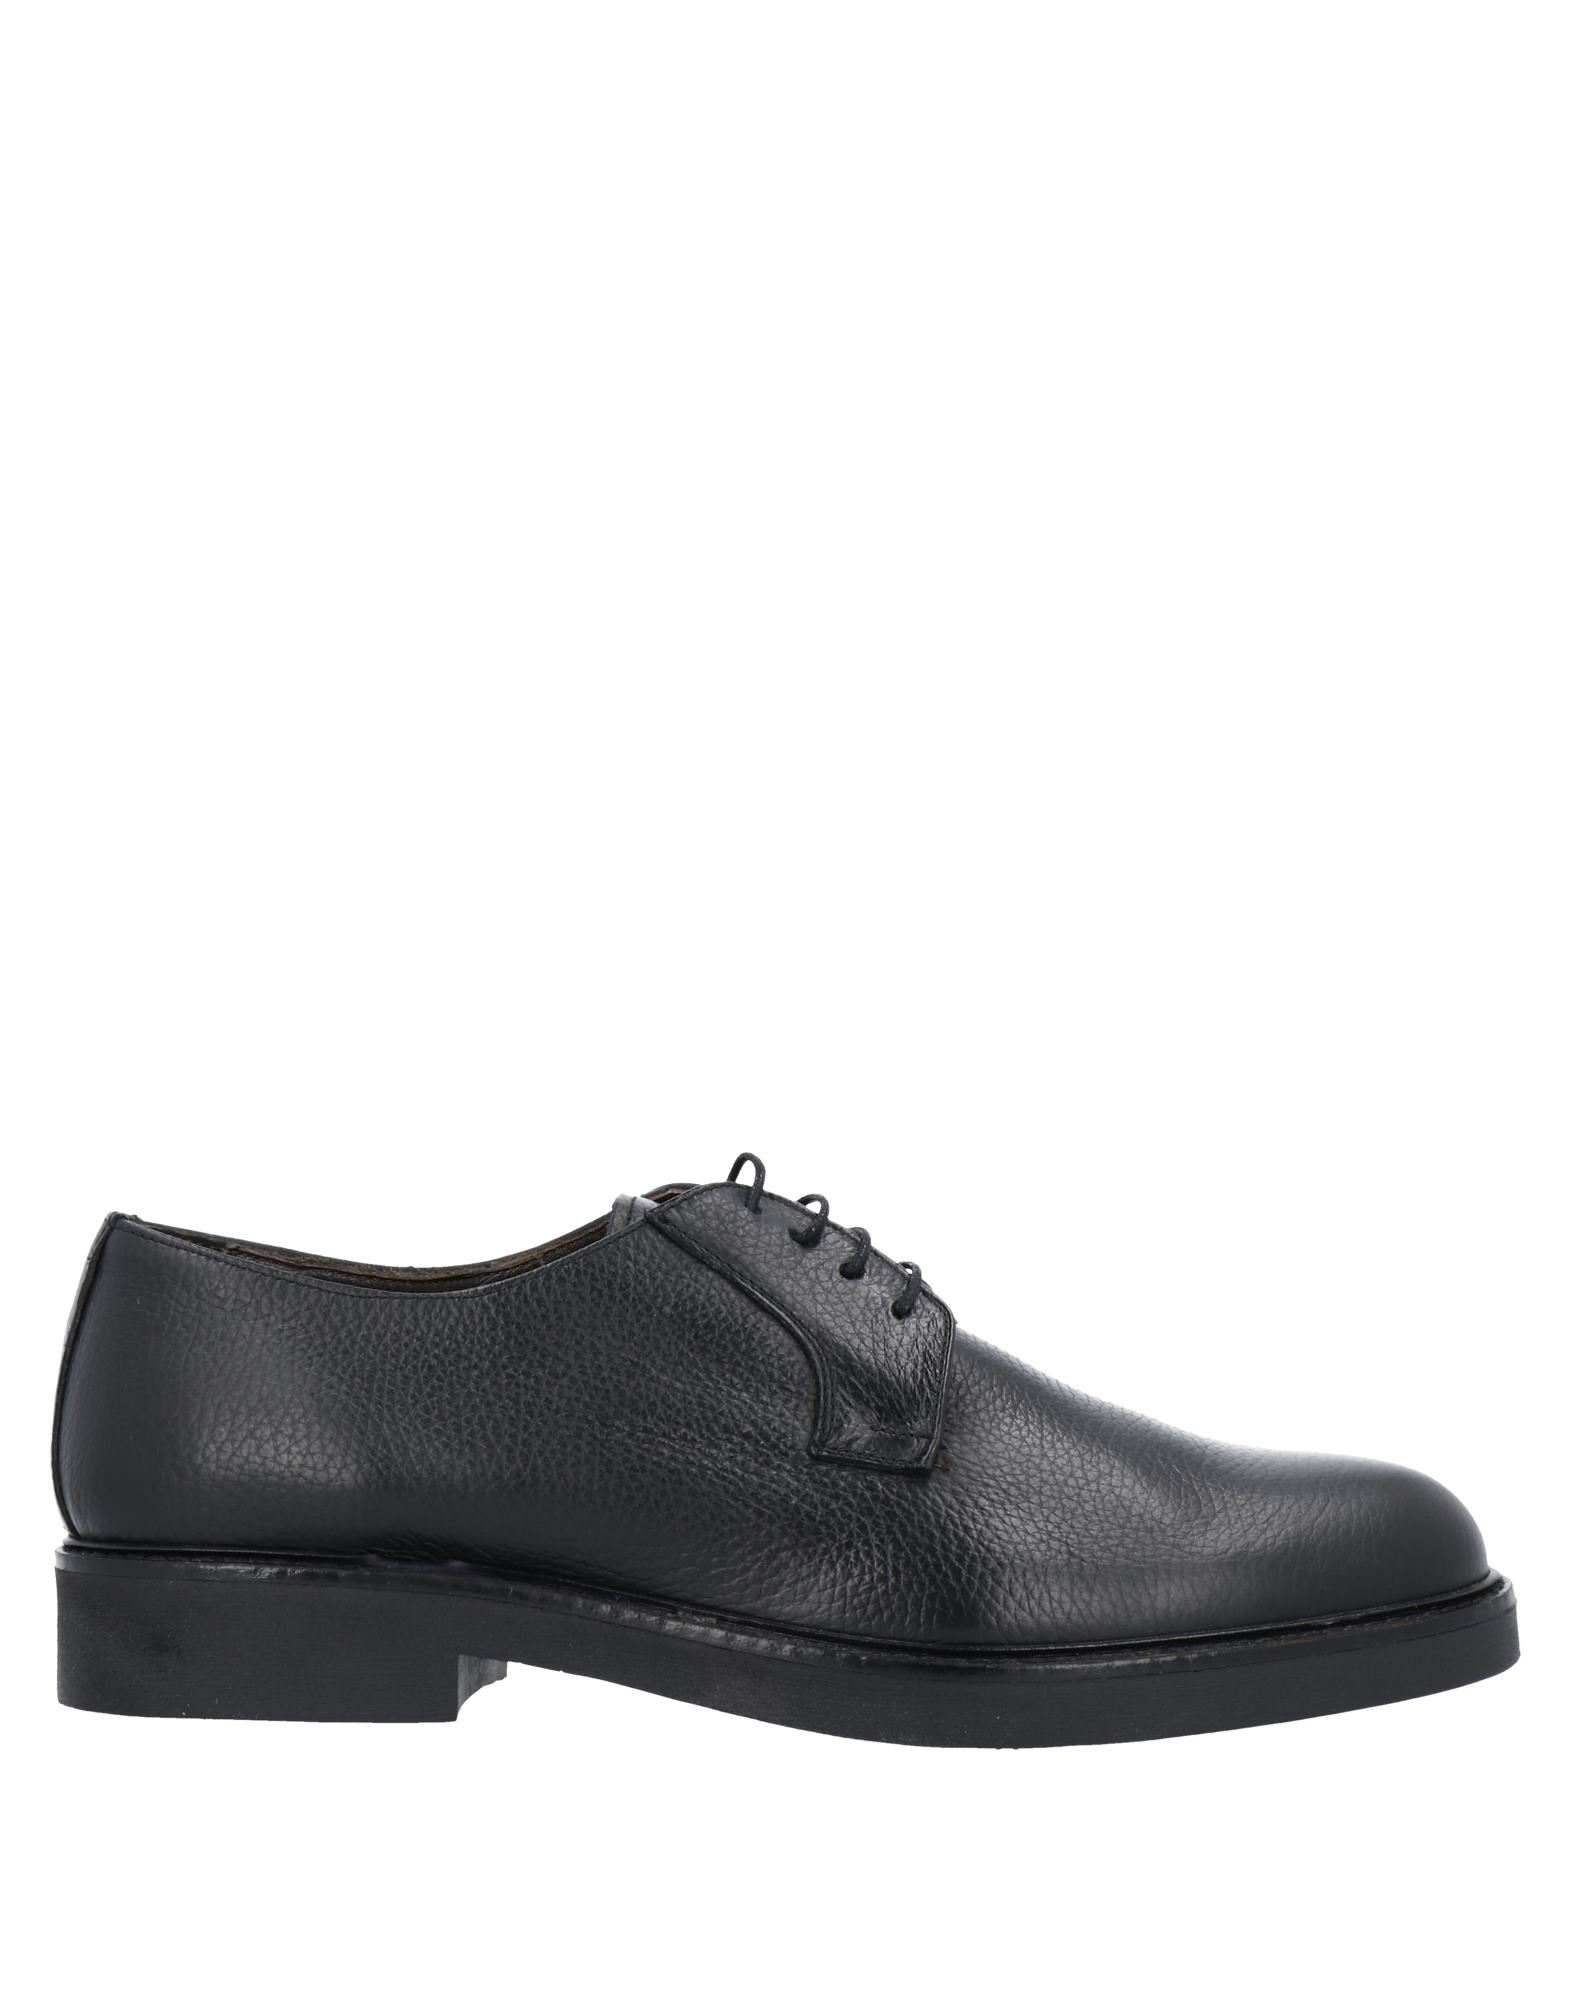 MR. SHOE by FENG SHOE Обувь на шнурках claudia by isaberi обувь на шнурках